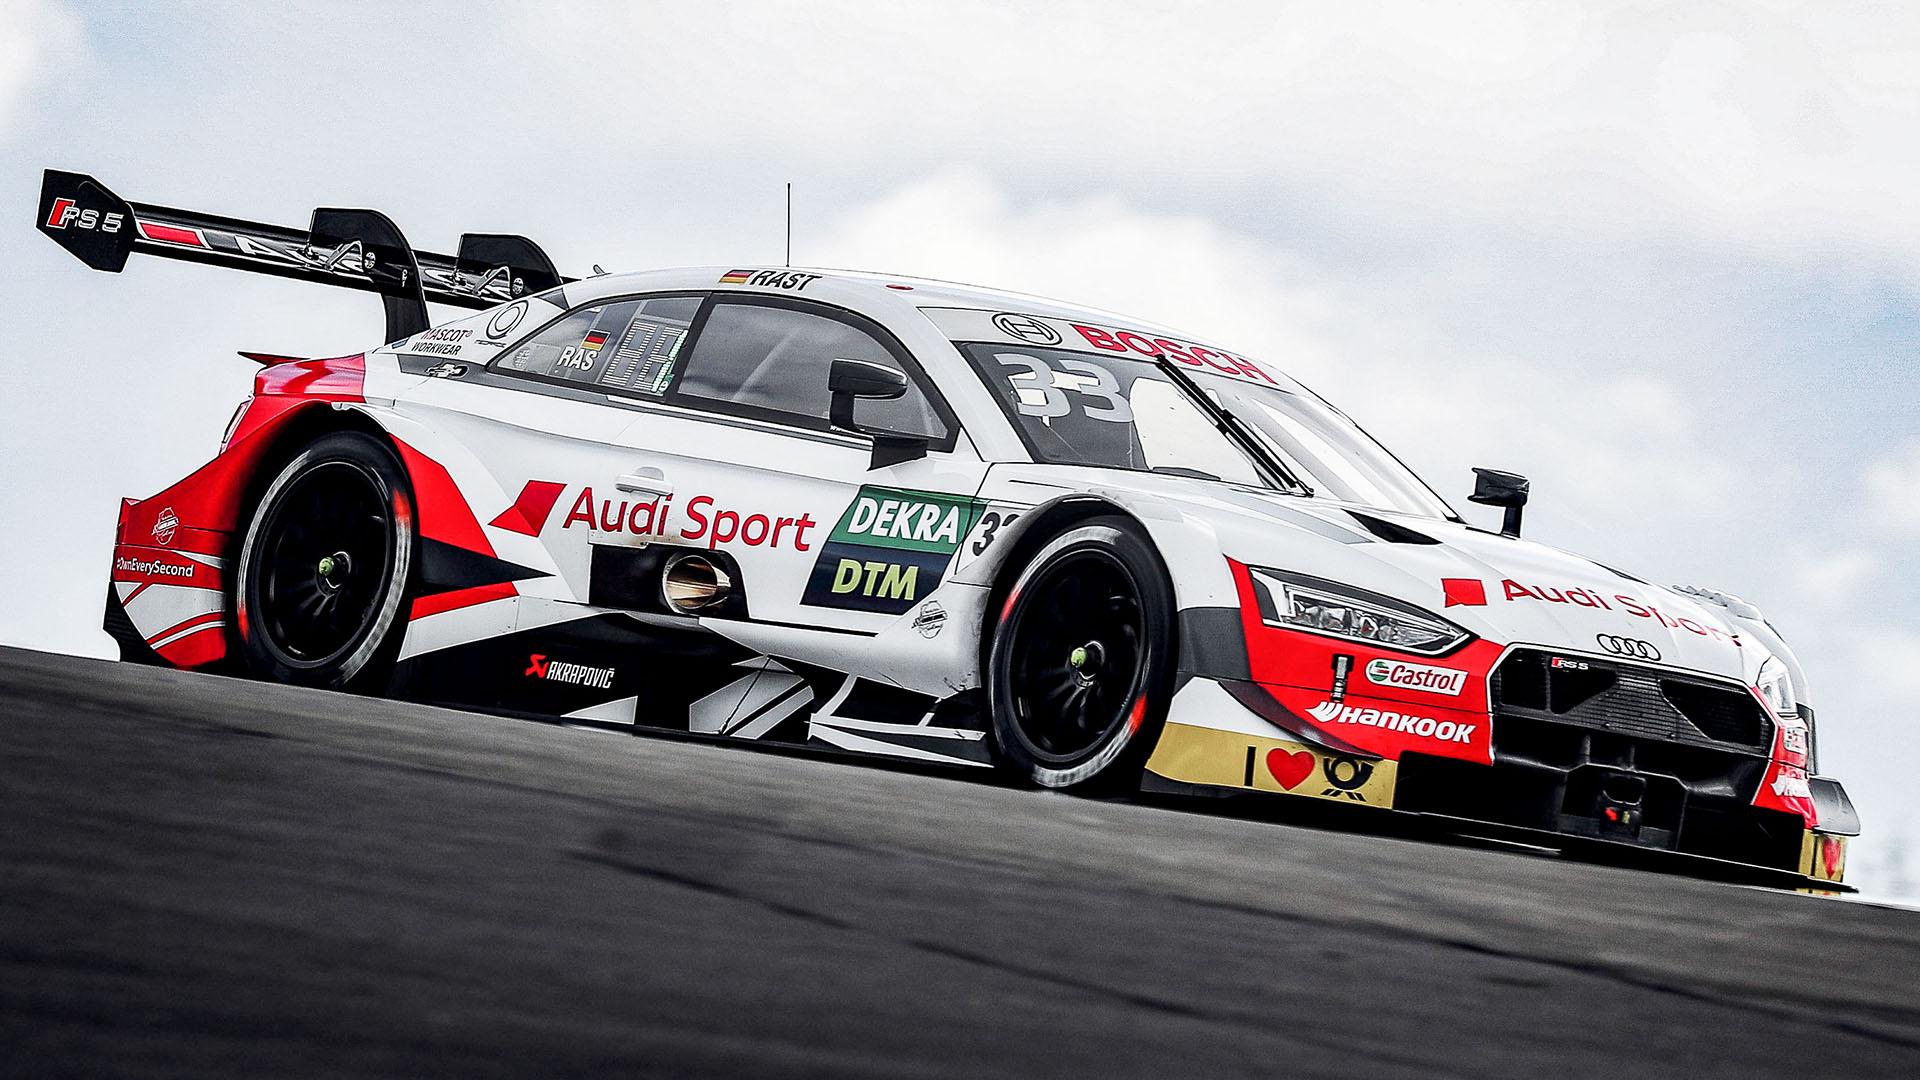 Audi Abandona Dtm Por Crisis De Covid 19 Carnews